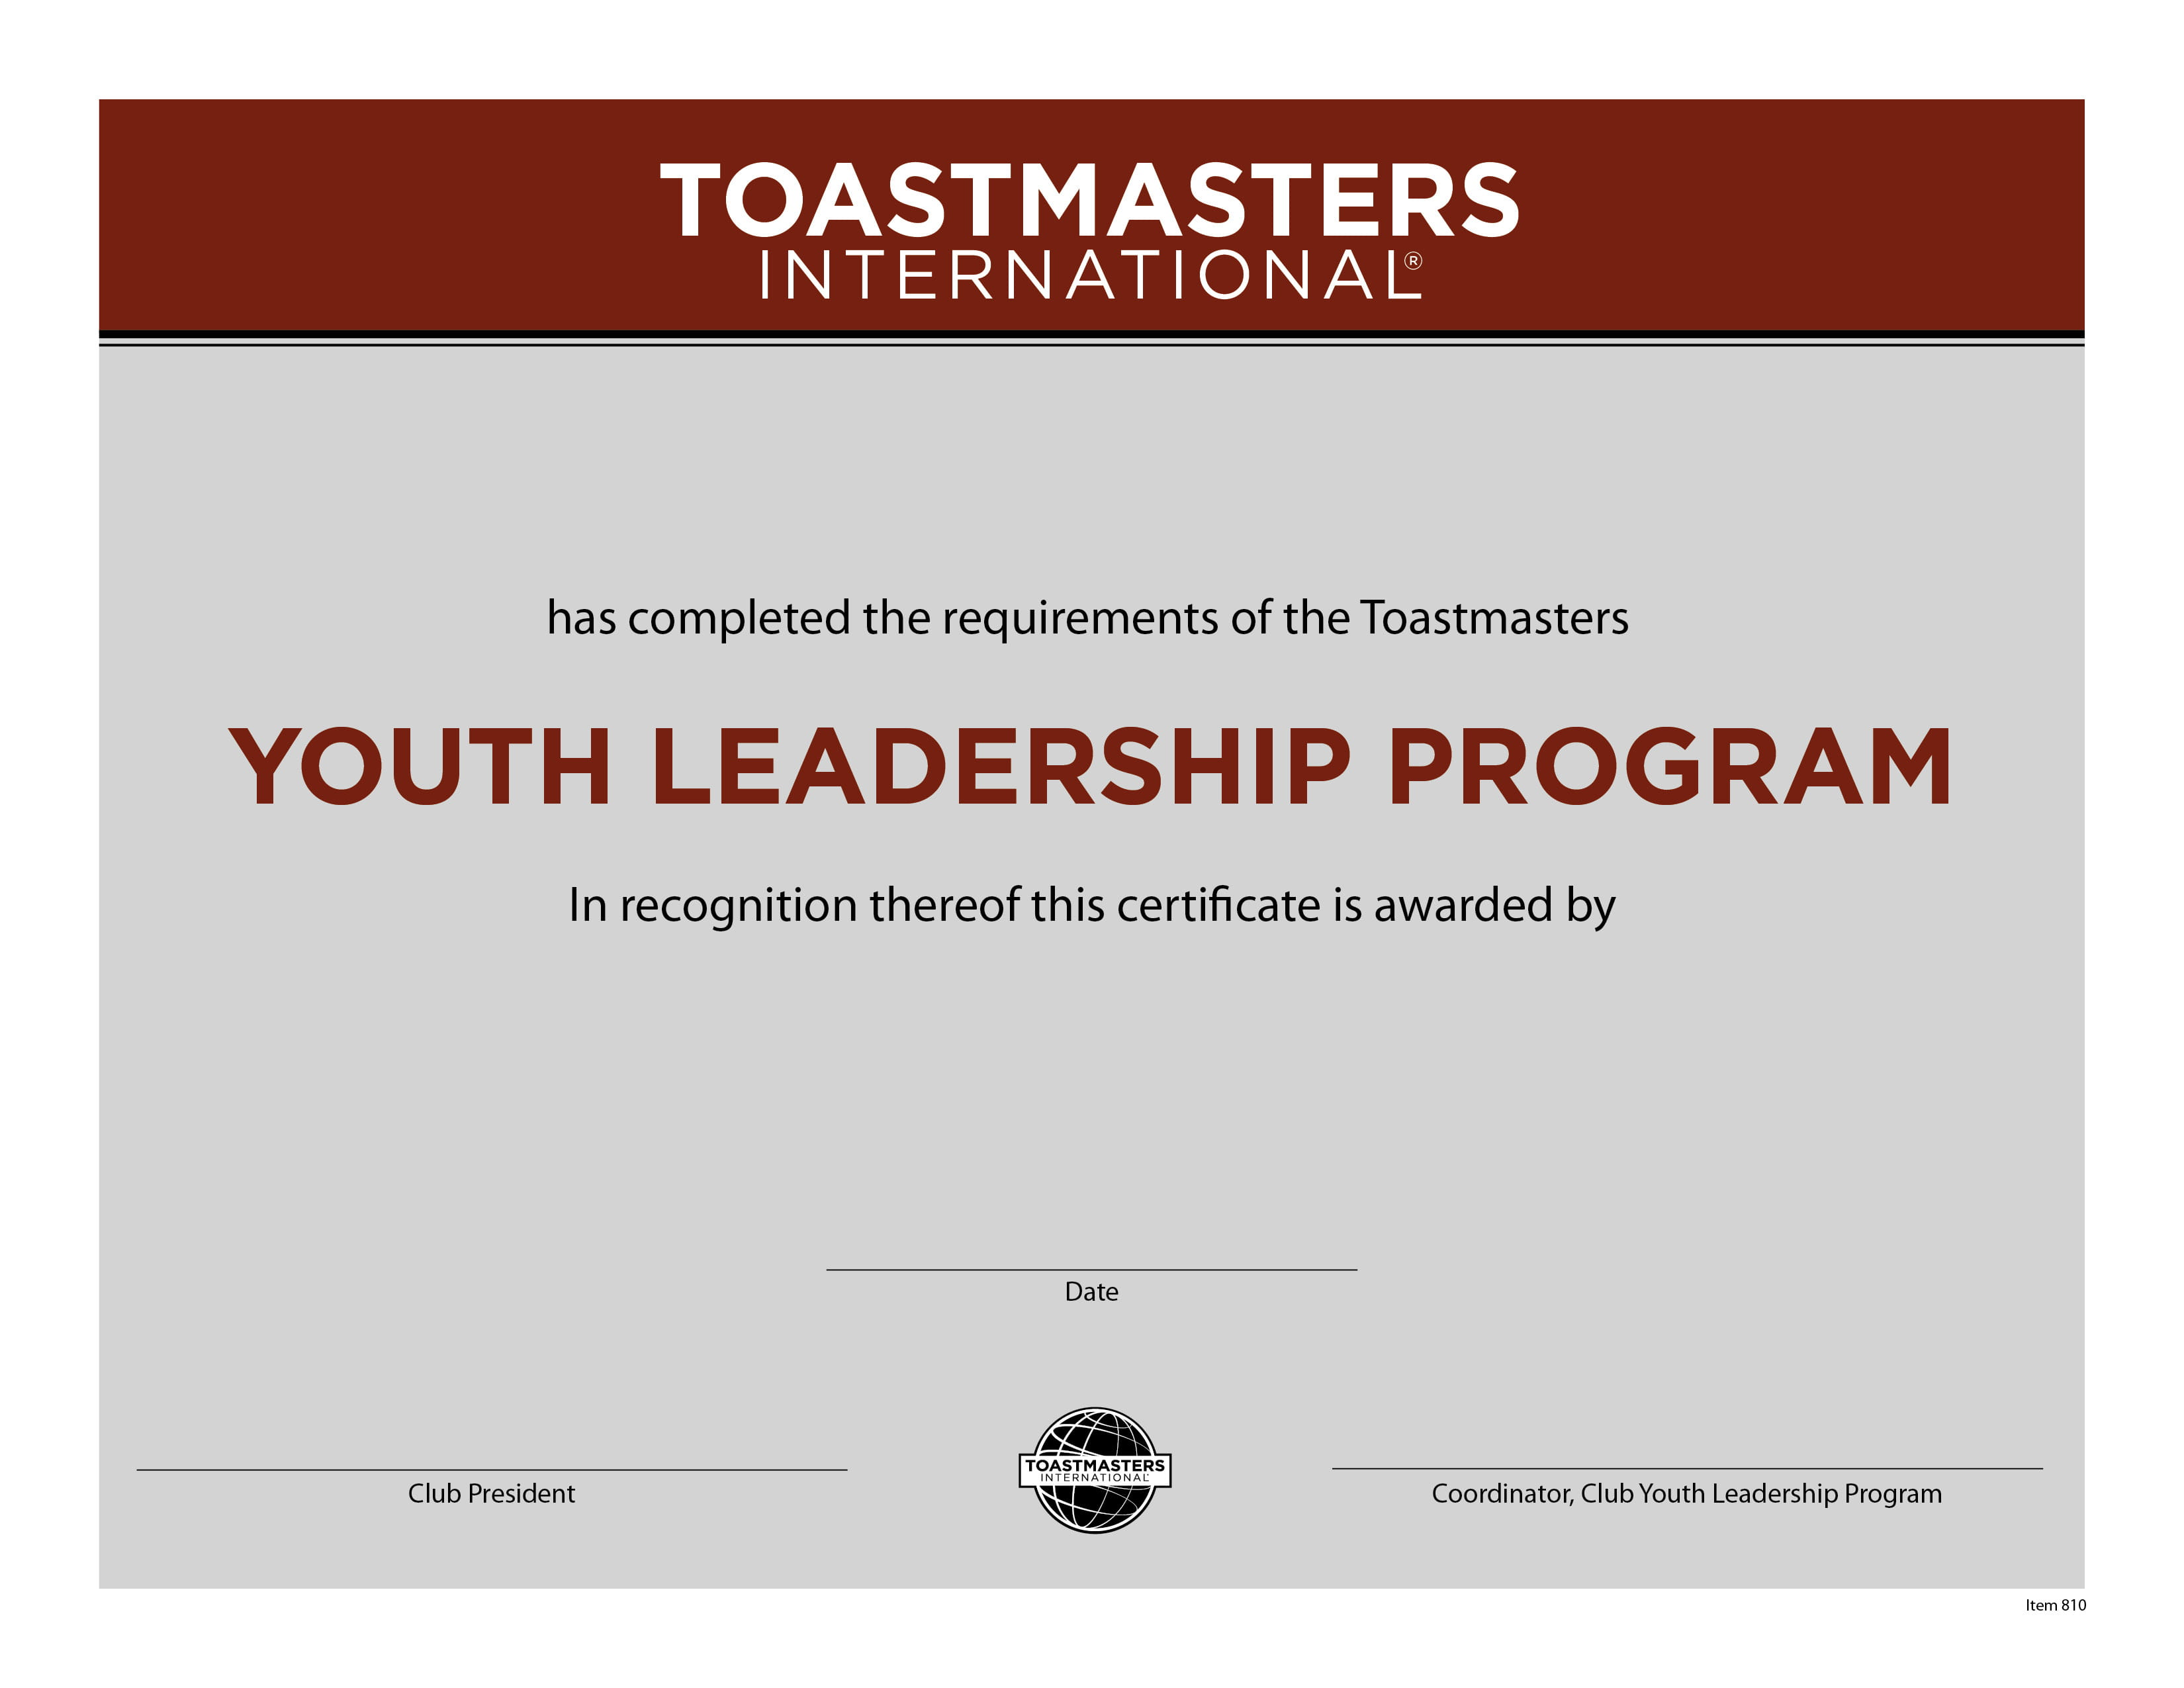 Youth leadership program toastmasters pdf